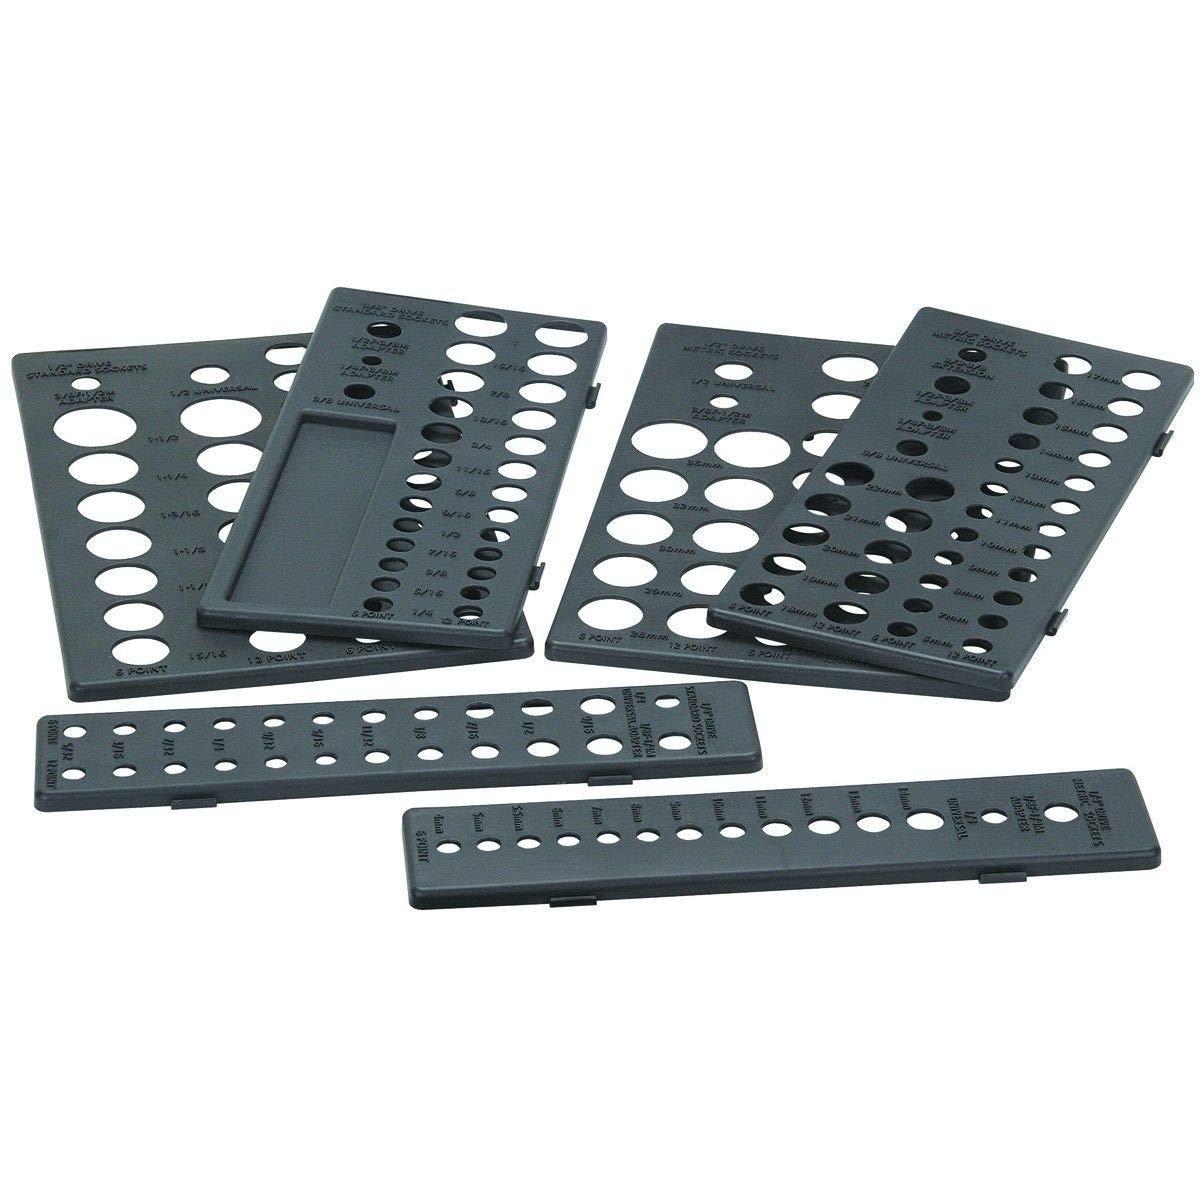 RX-789 Plastic Metric SAE Socket Holder Holding Rack Drawer Organizer for Tool Box Black